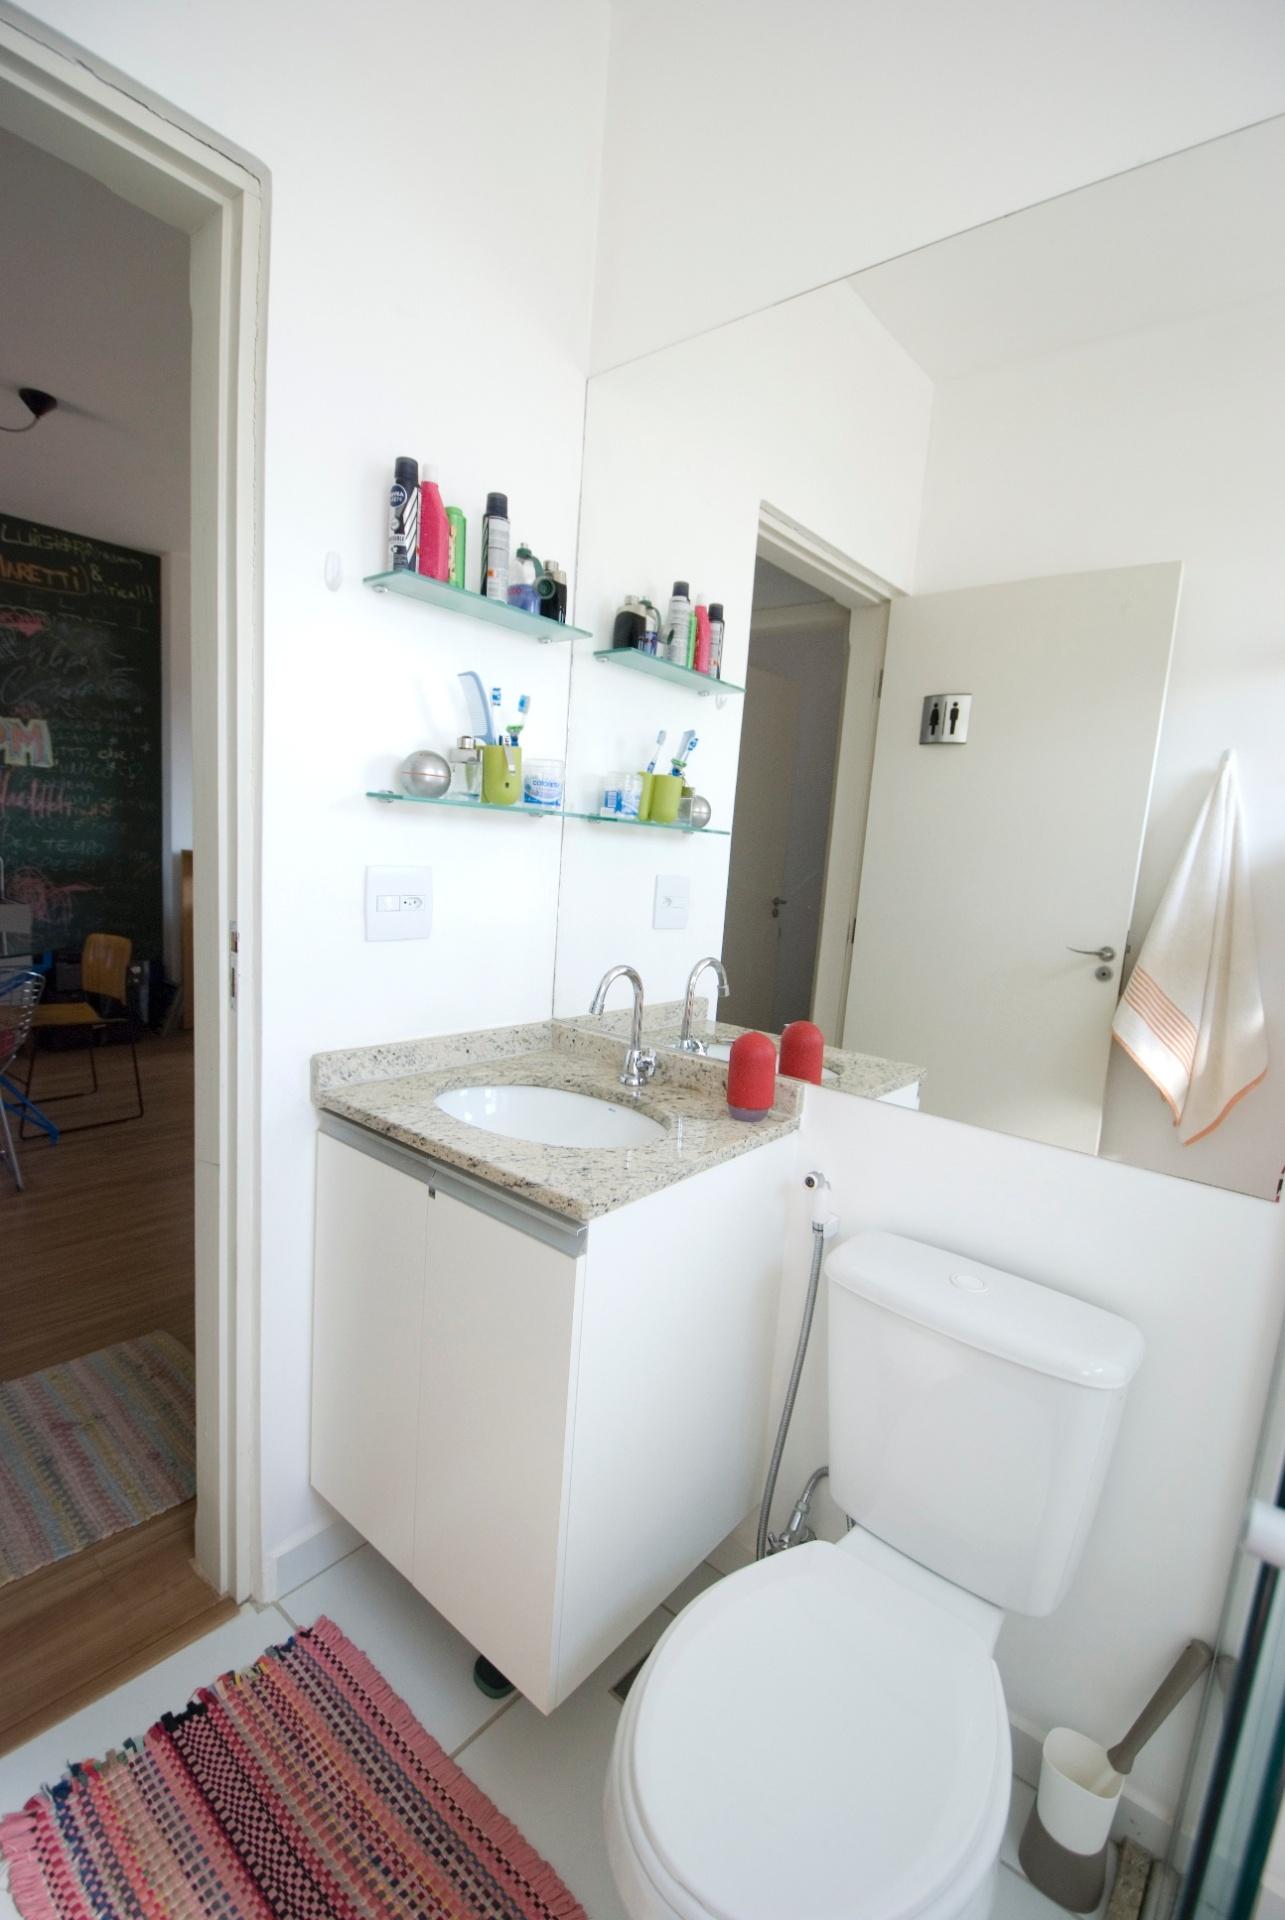 banheiro pedras de granito para banheiros bloco de vidro para banheiro #684641 1285 1920